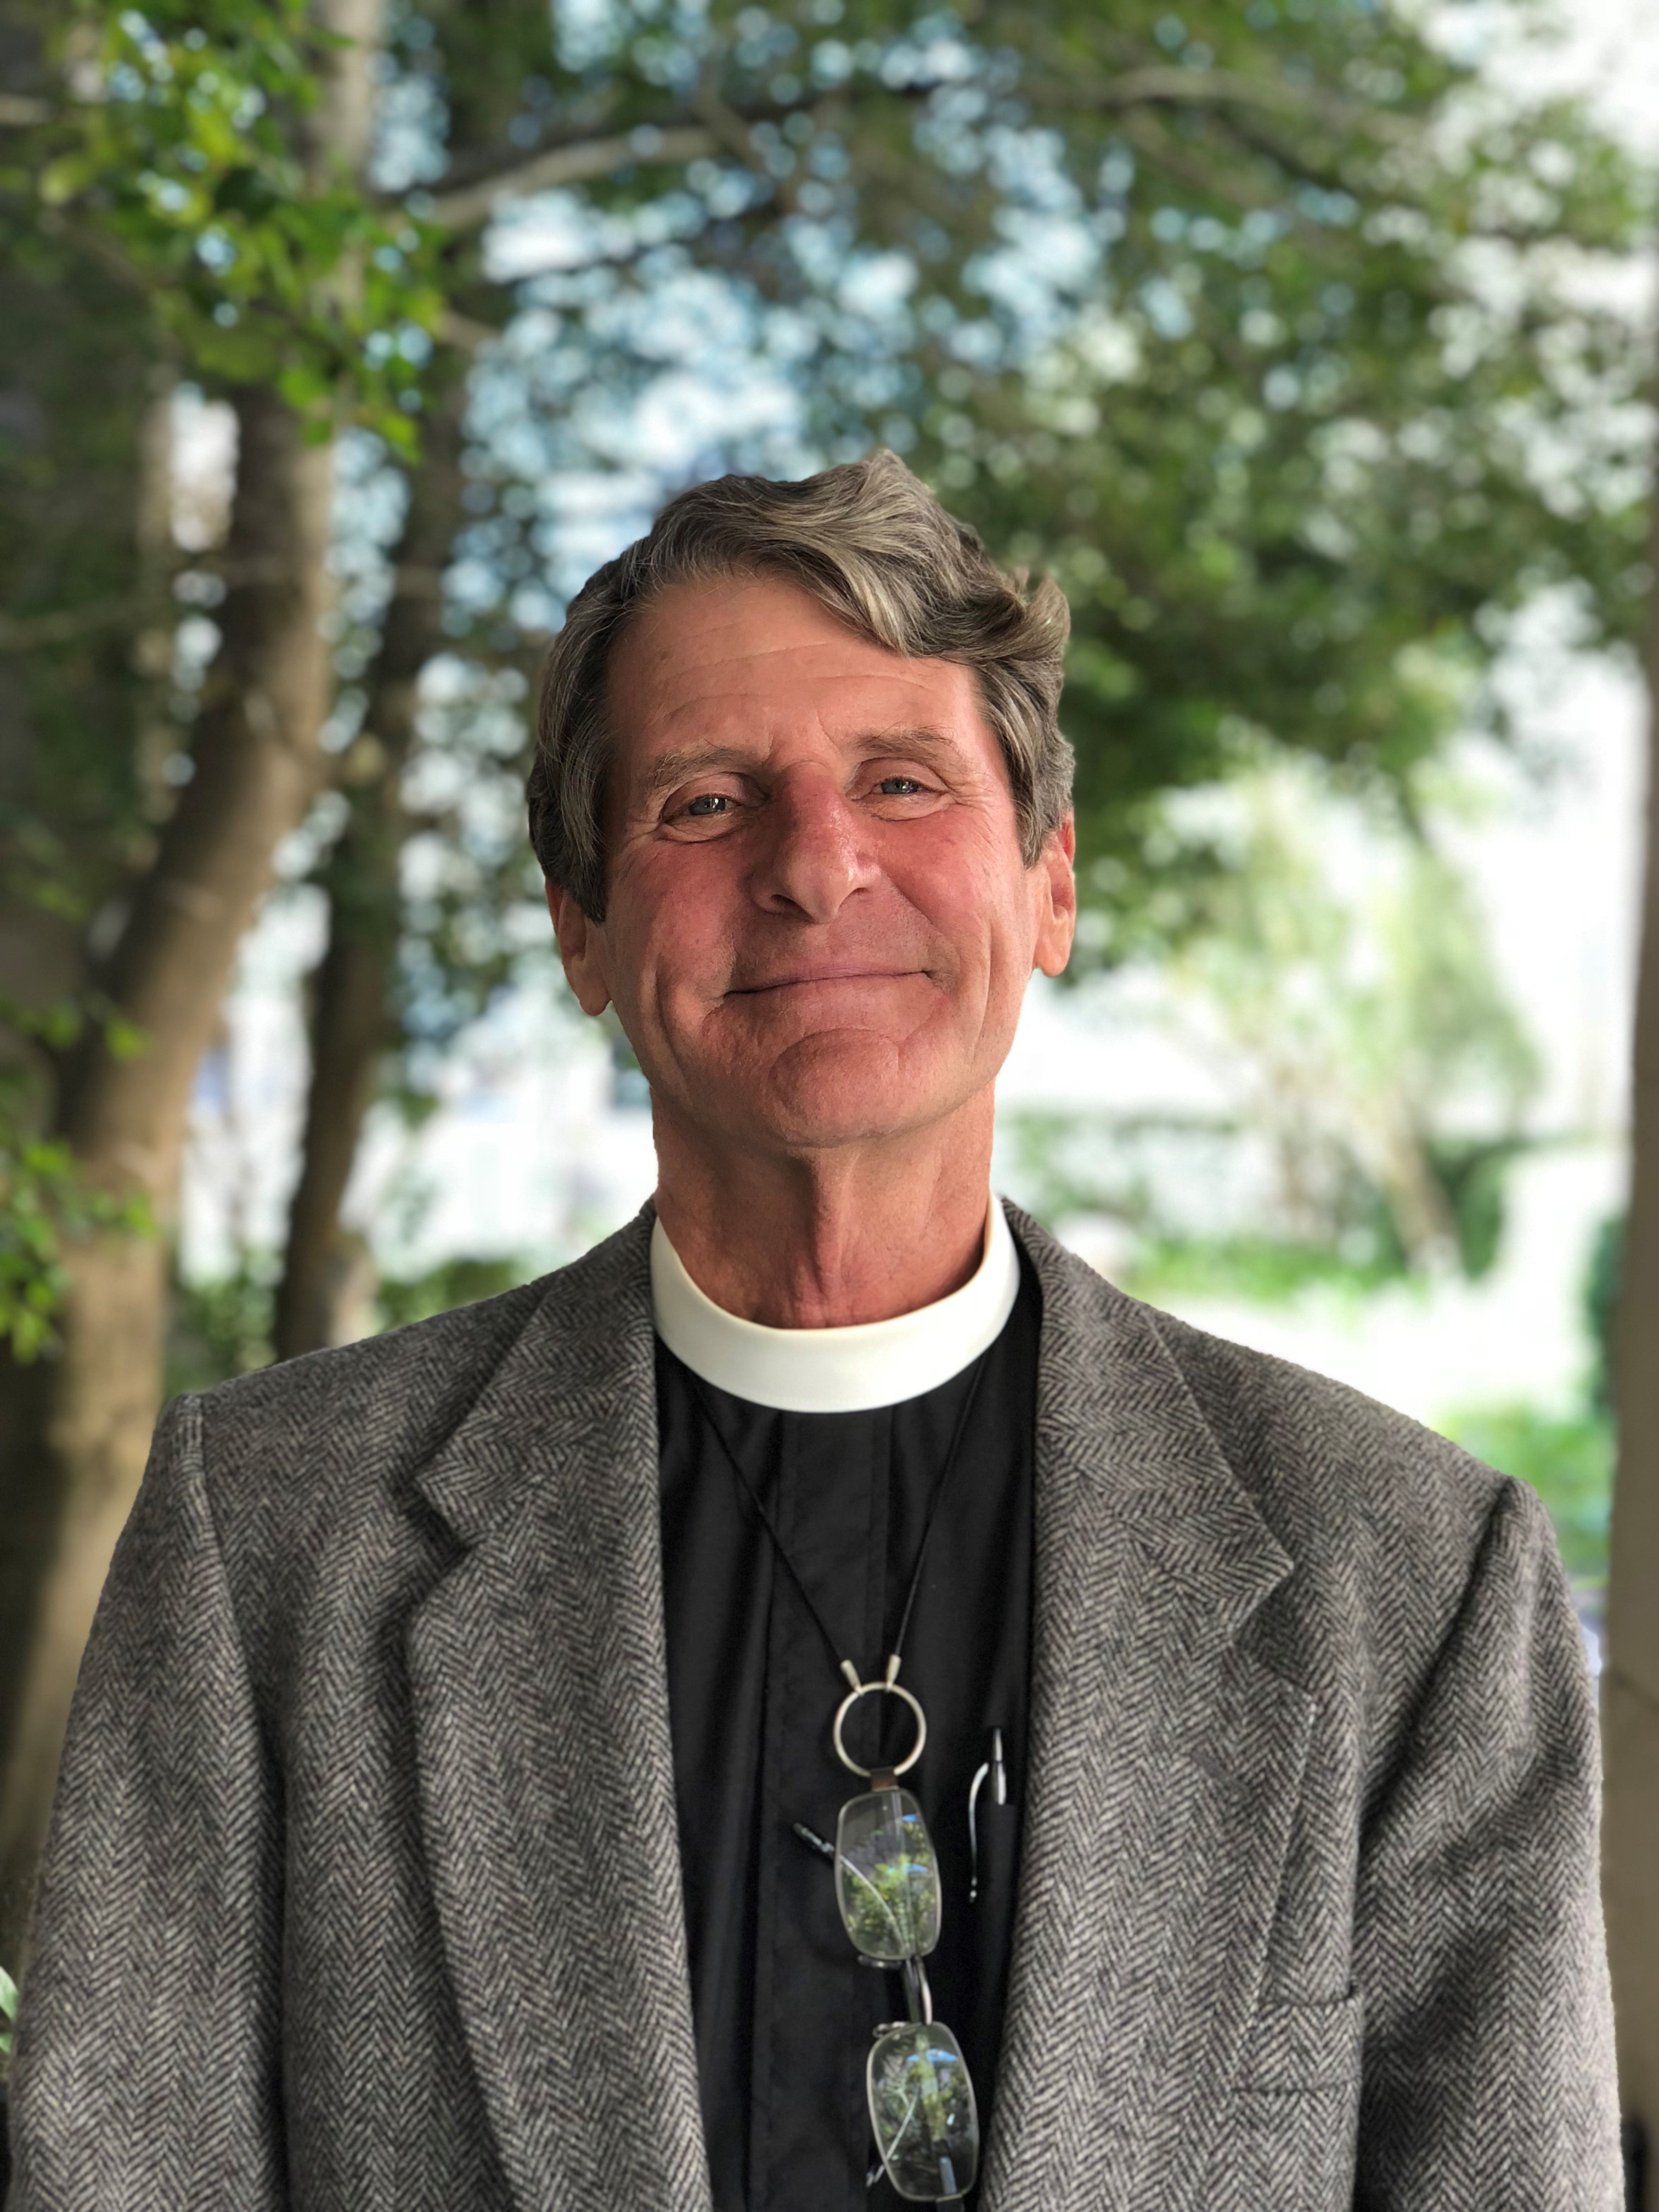 The Rev. Edward Harrison